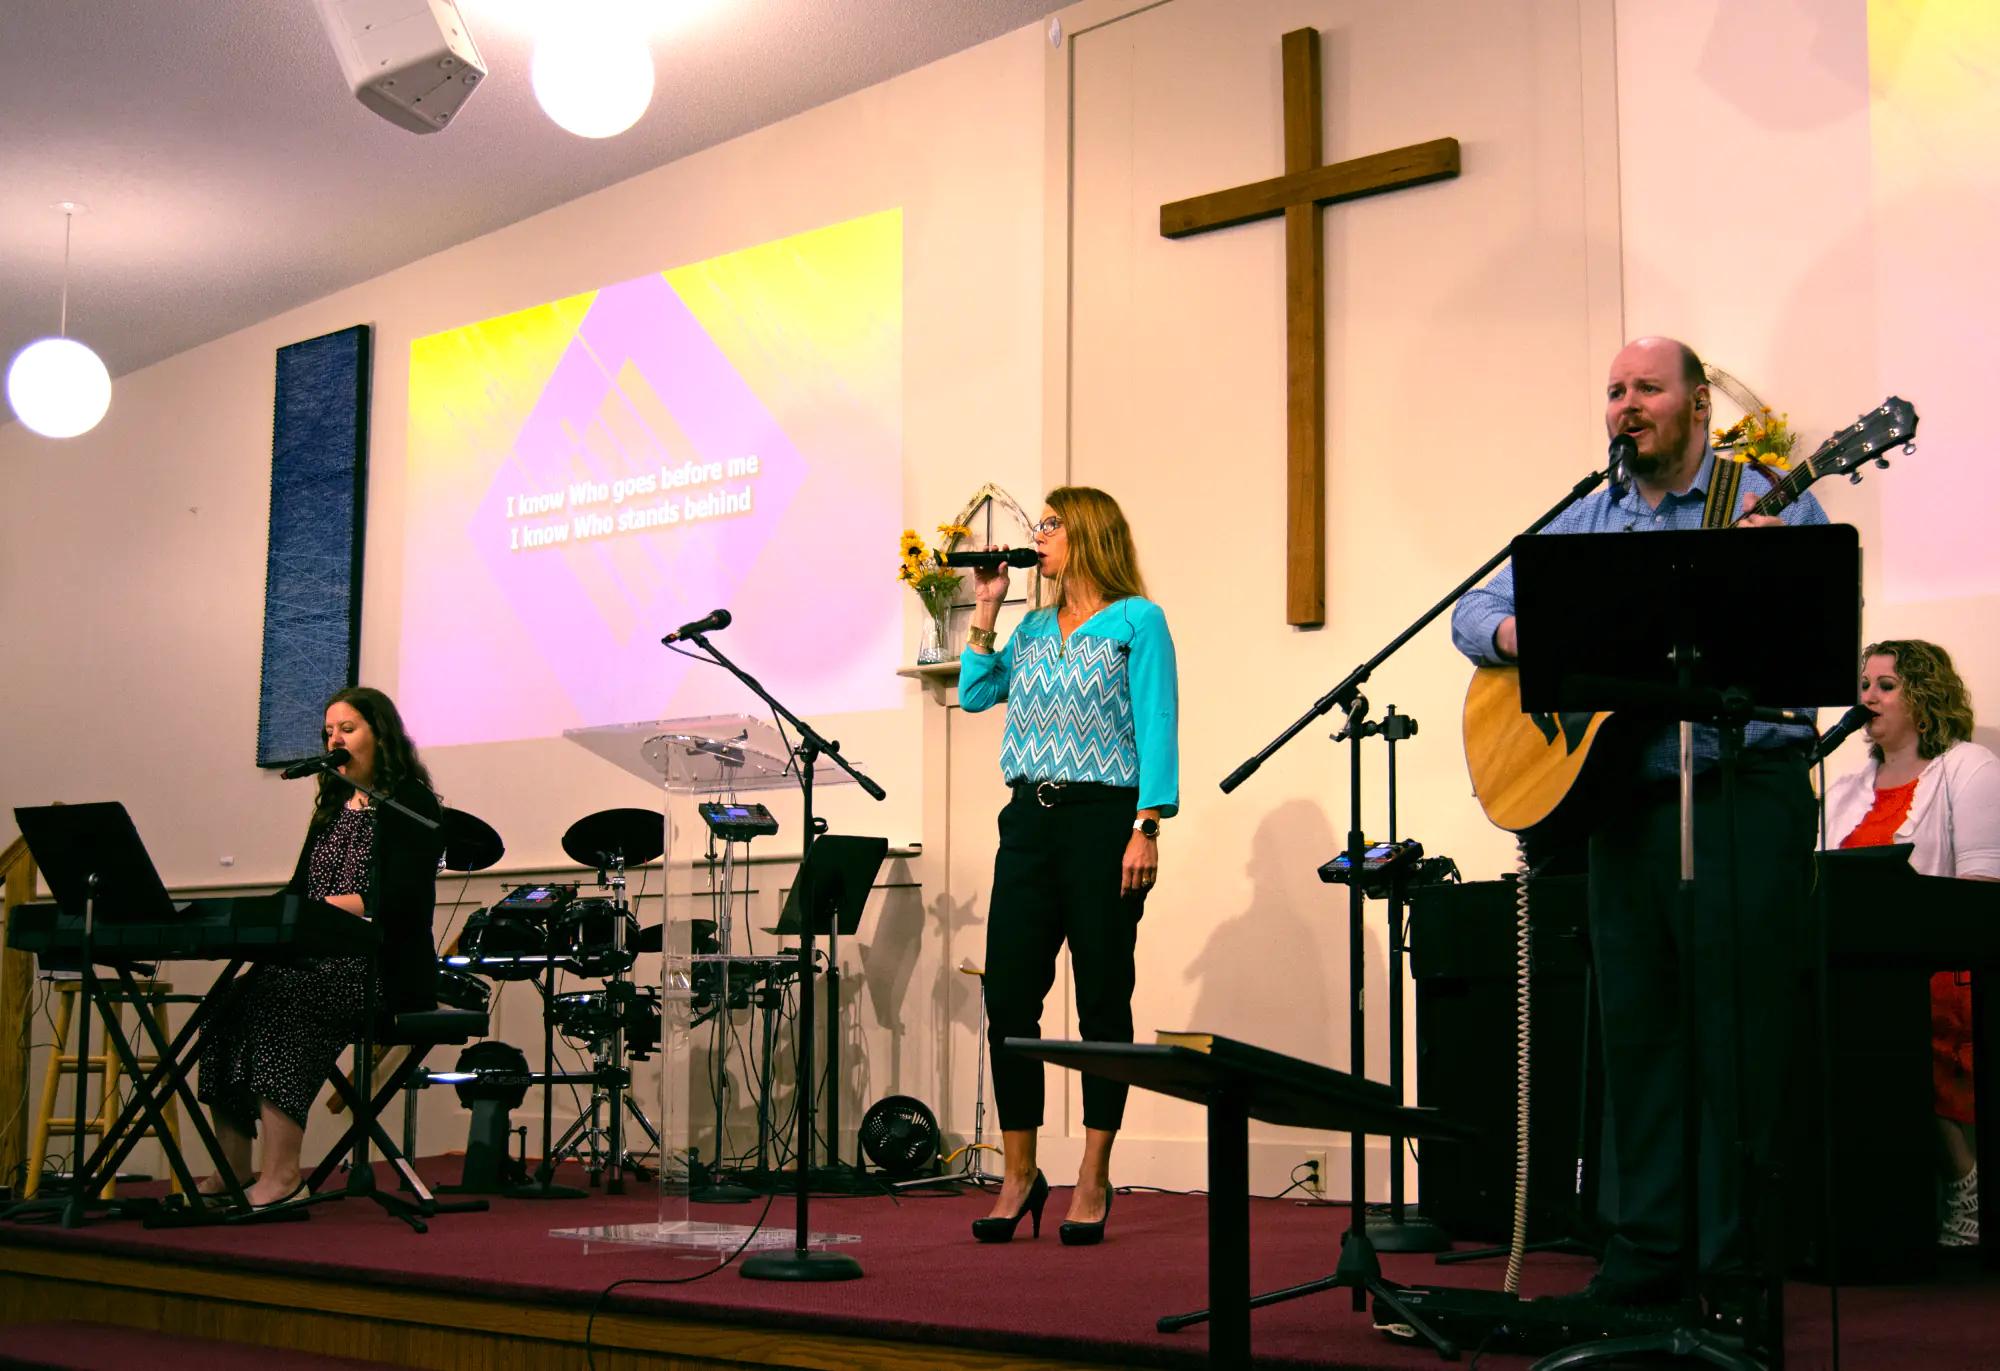 https://gpc-media.s3.amazonaws.com/images/worship-team-01.jpg